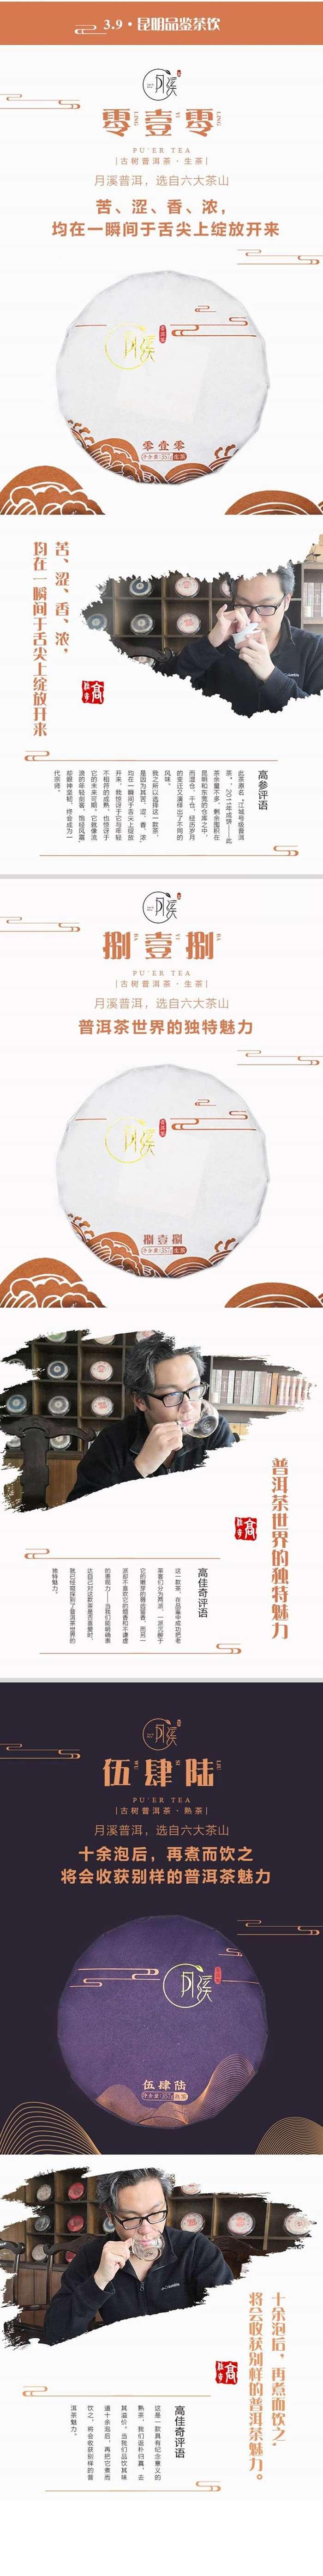 http://www.huodongxing.com/file/20190301/3713346654578/403346919528727.jpg